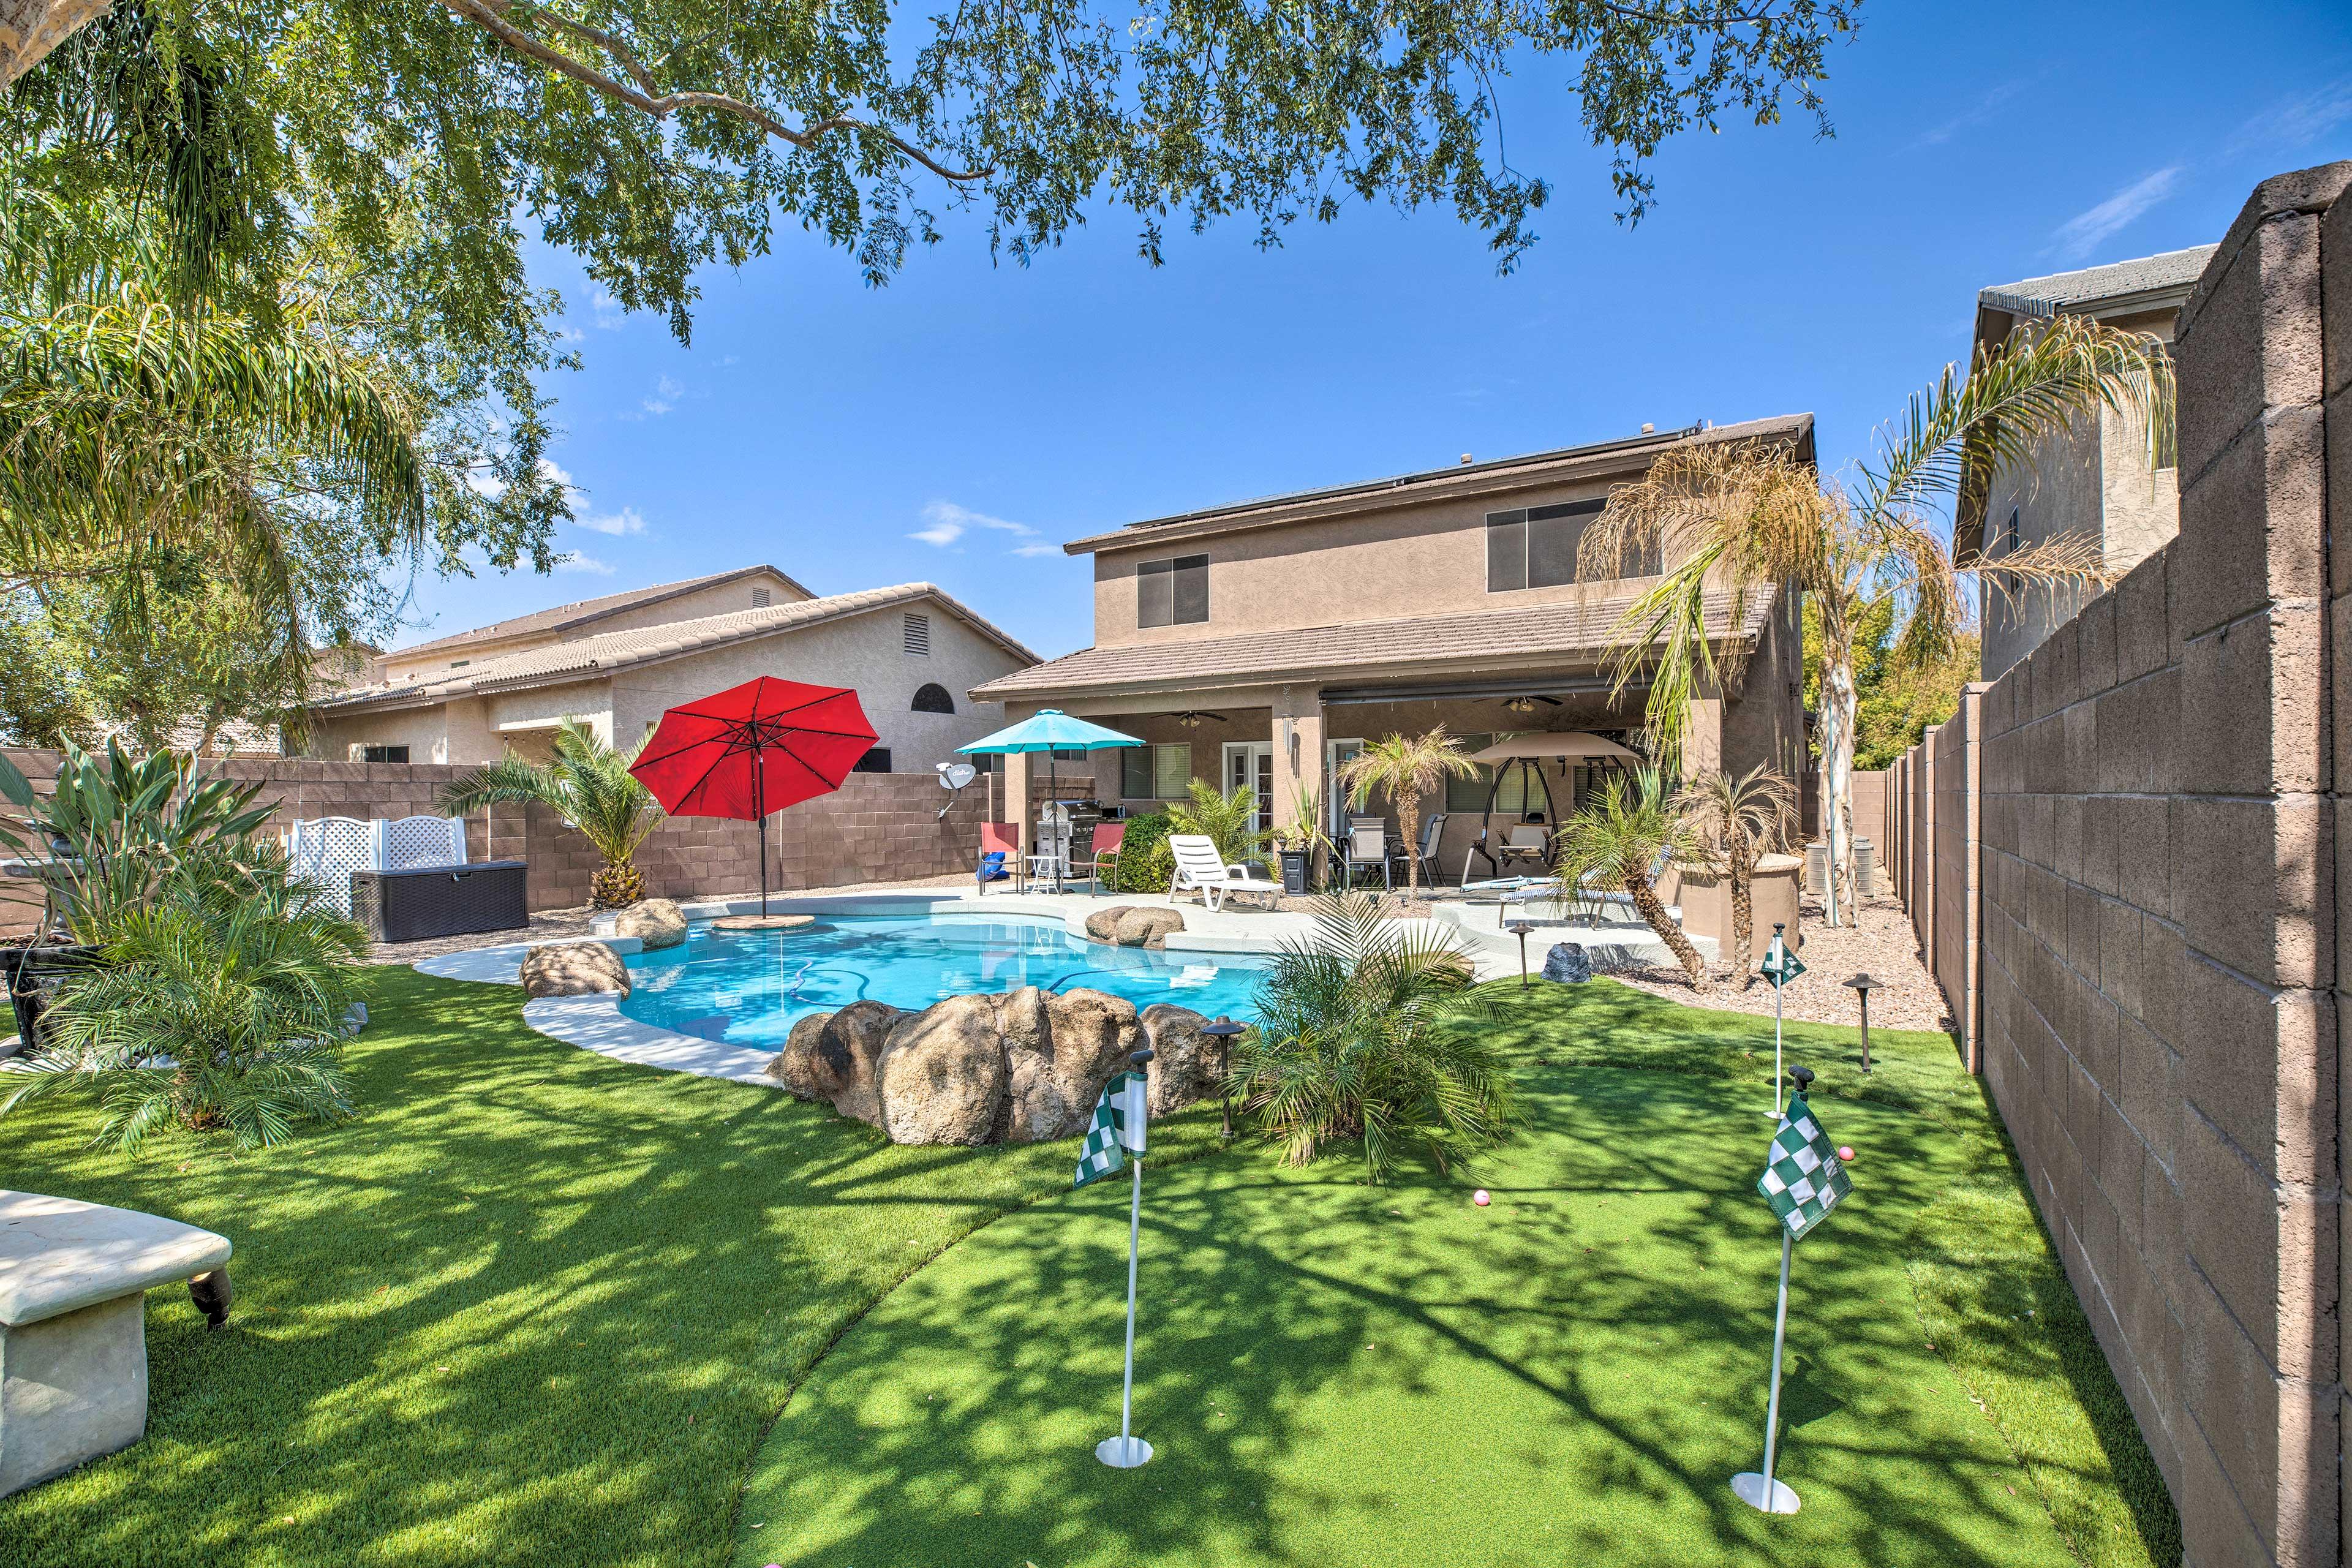 Dive into your next Arizona getaway at this stunning vacation rental!